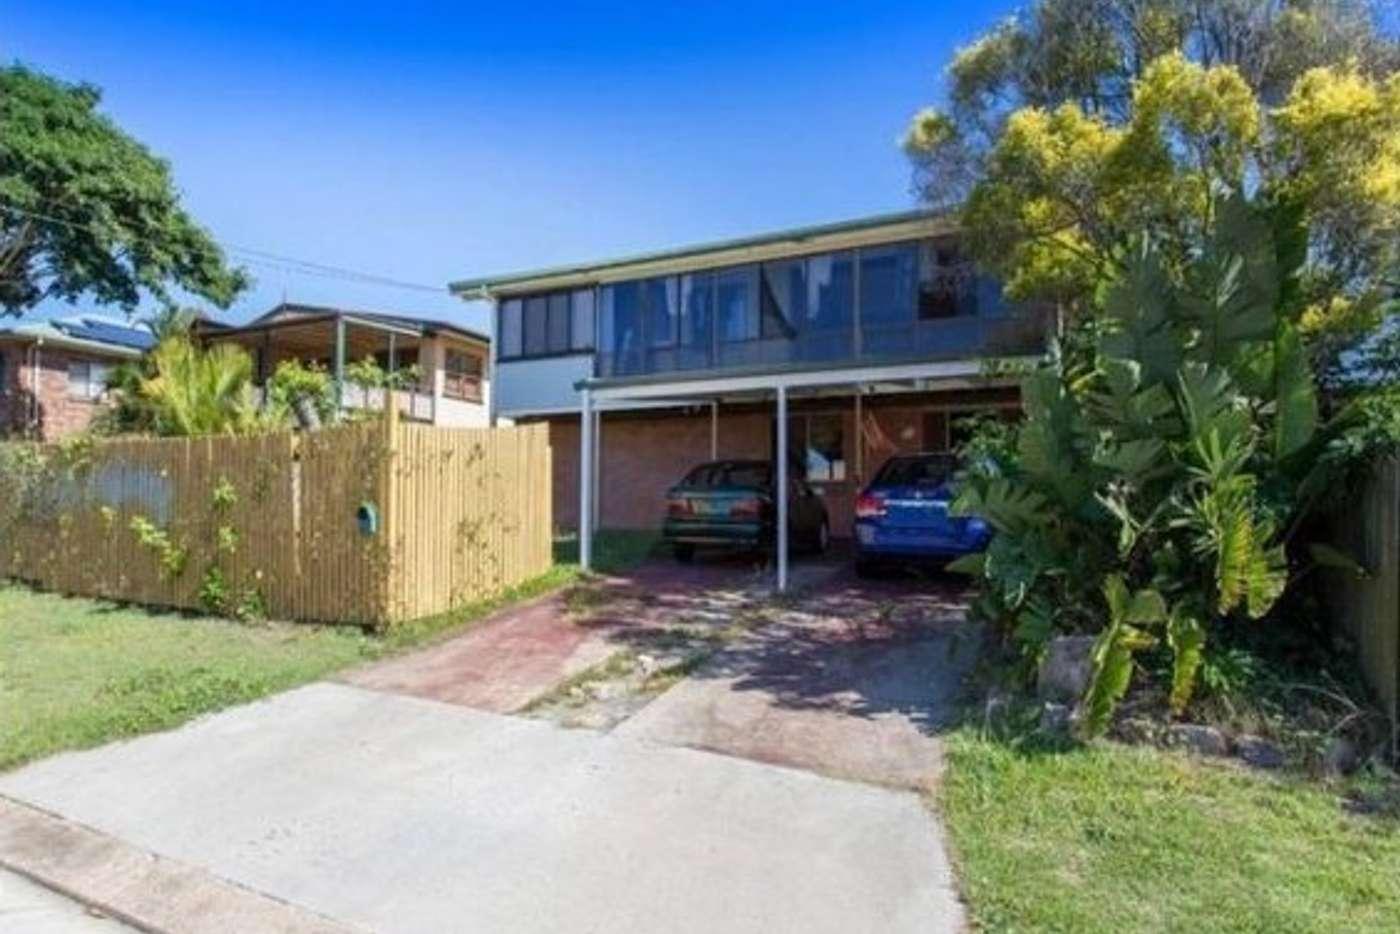 Main view of Homely house listing, 25 Macfarlane Street, Kippa-ring QLD 4021